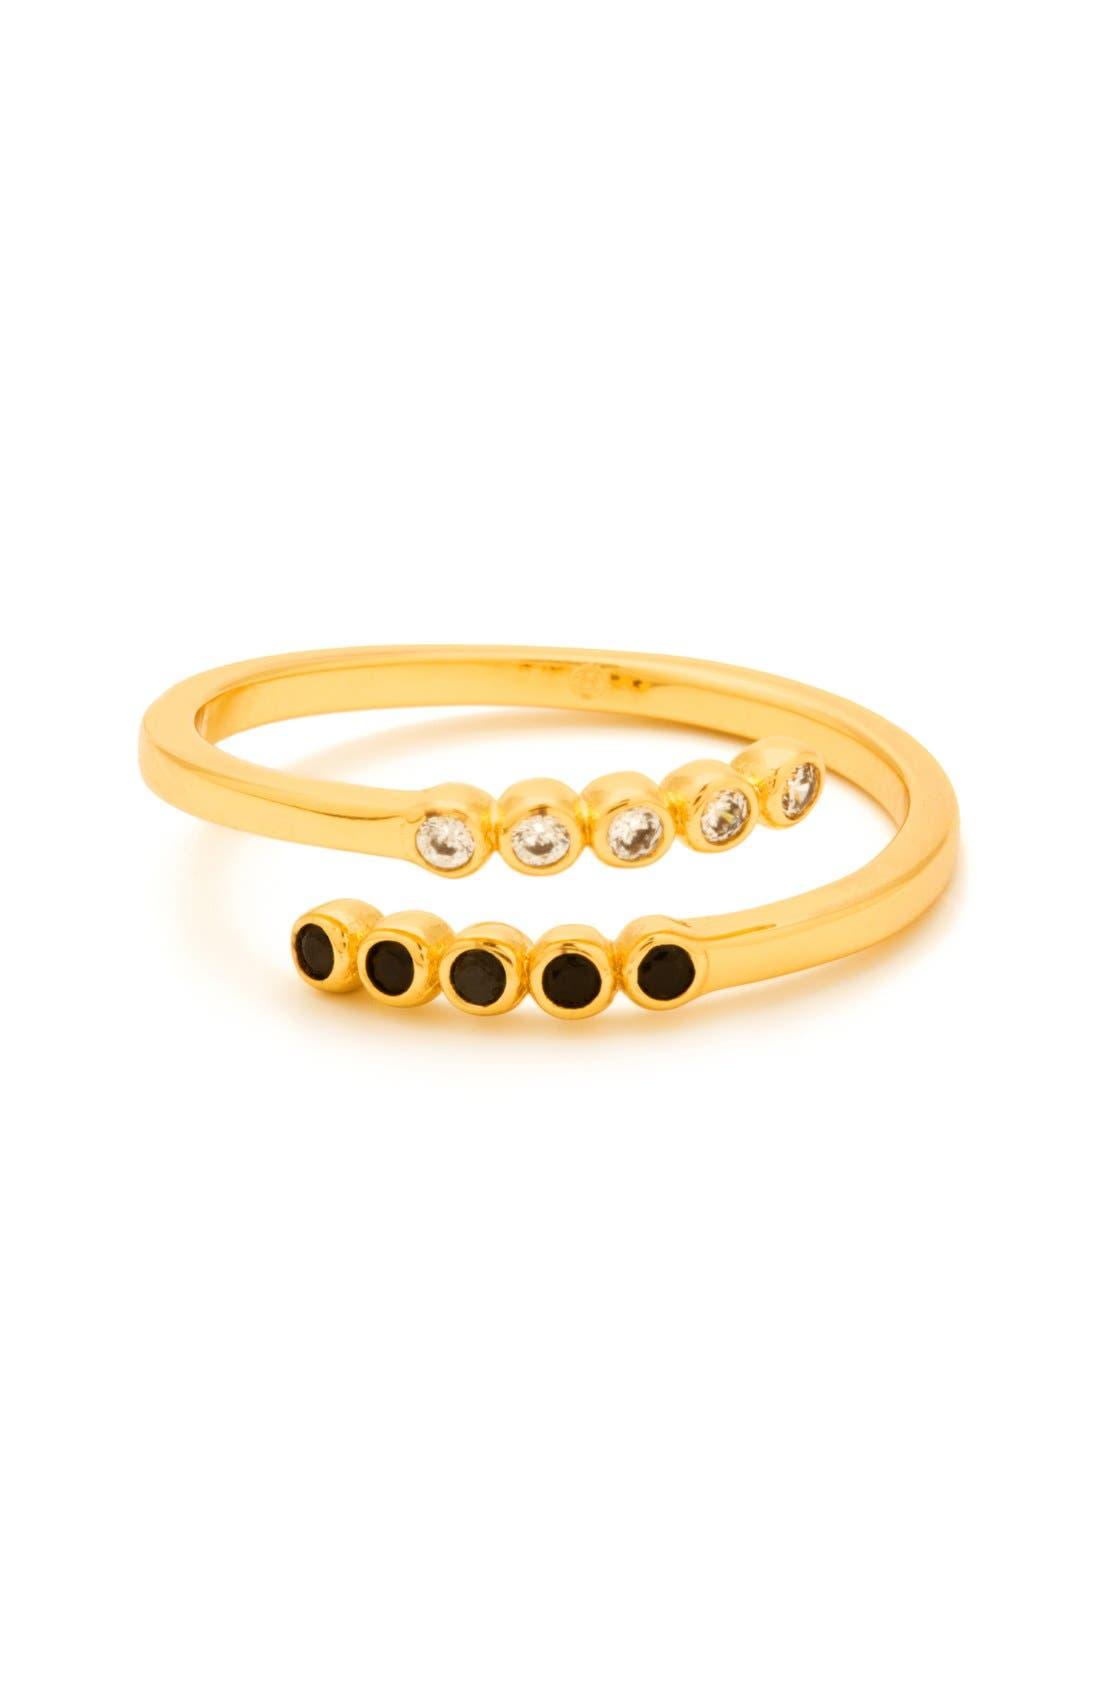 Main Image - gorjana 'Dita' Midi Ring